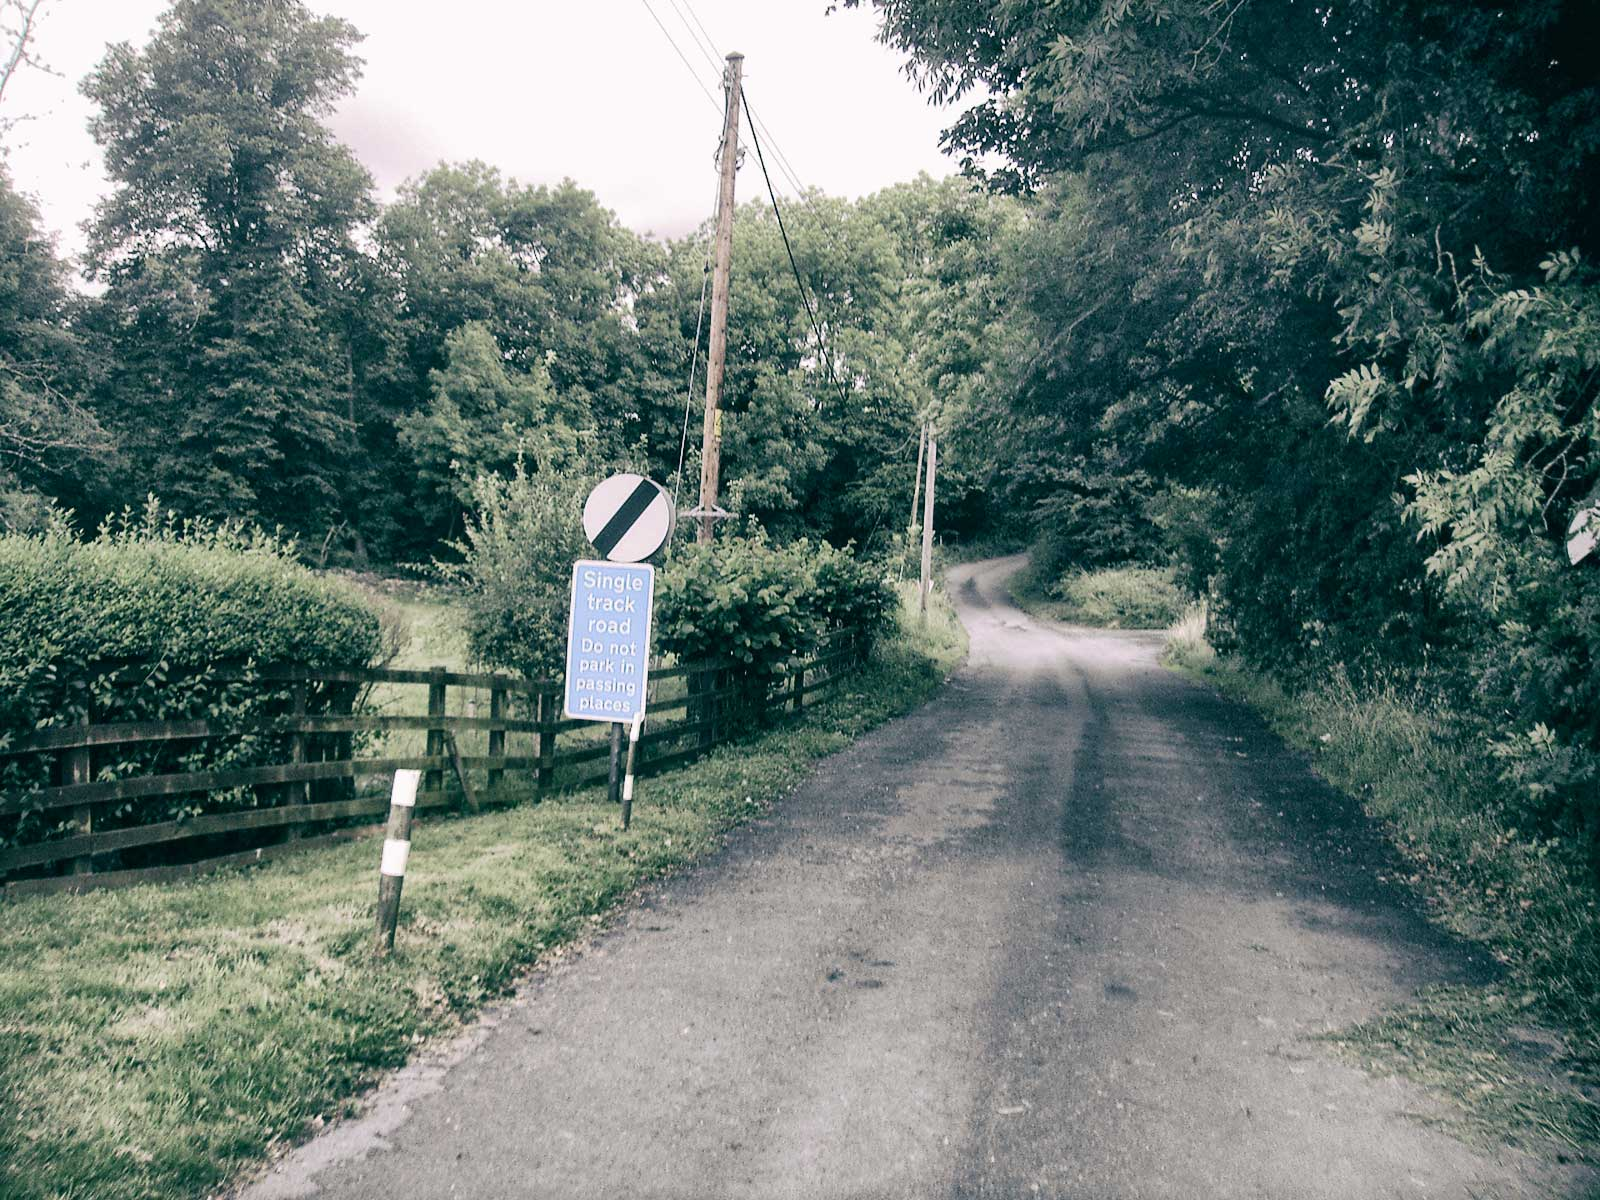 Ingleton - Thornton in Lonsdale Bike Route